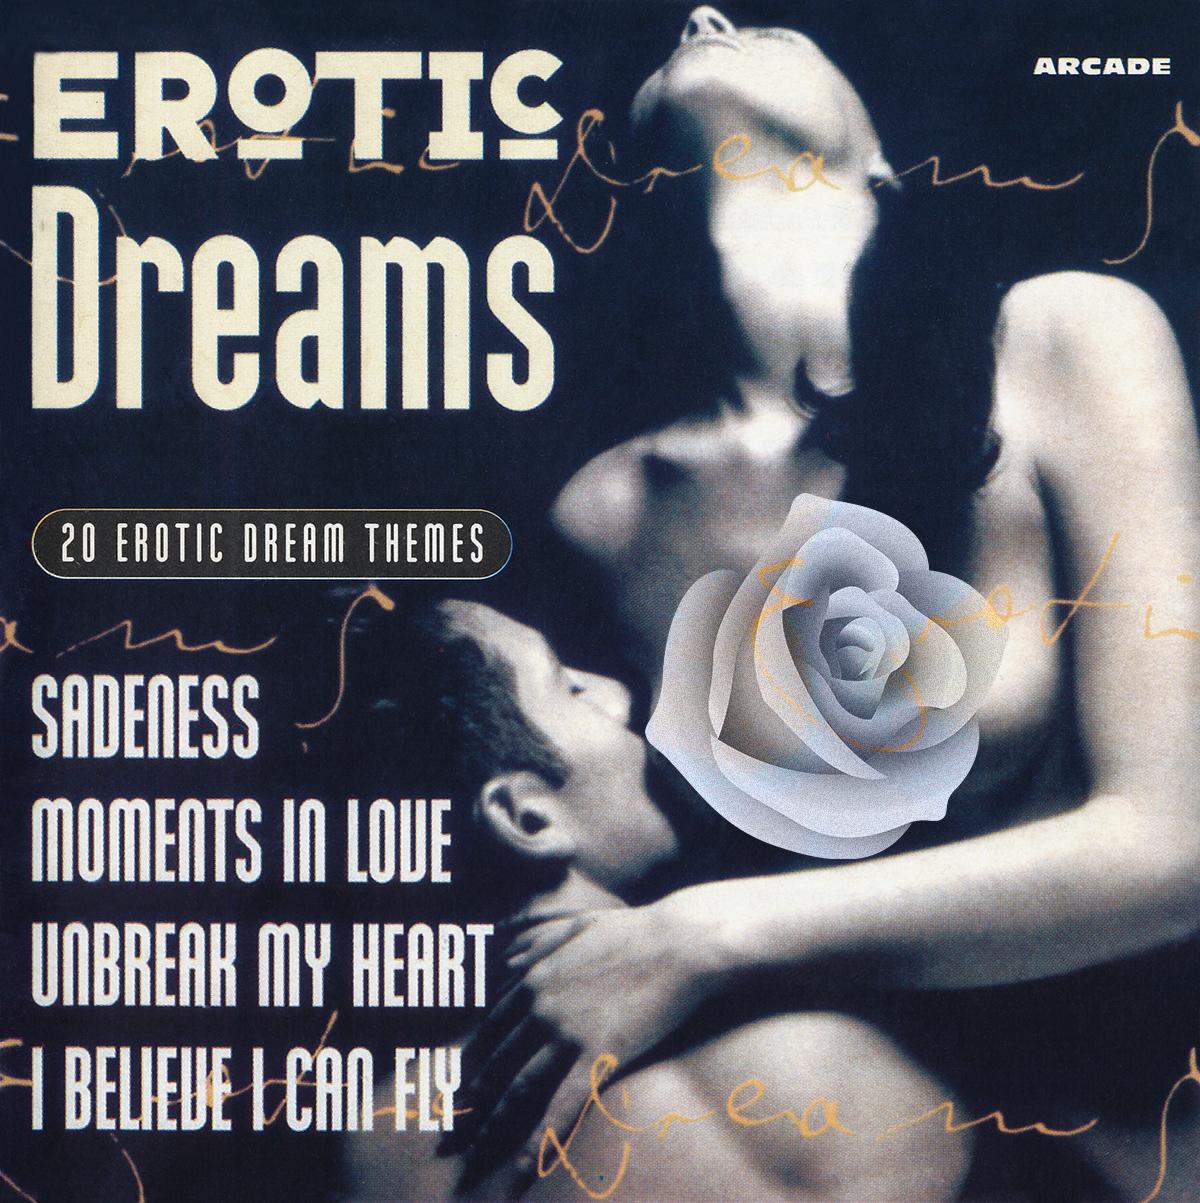 Errotic dreams